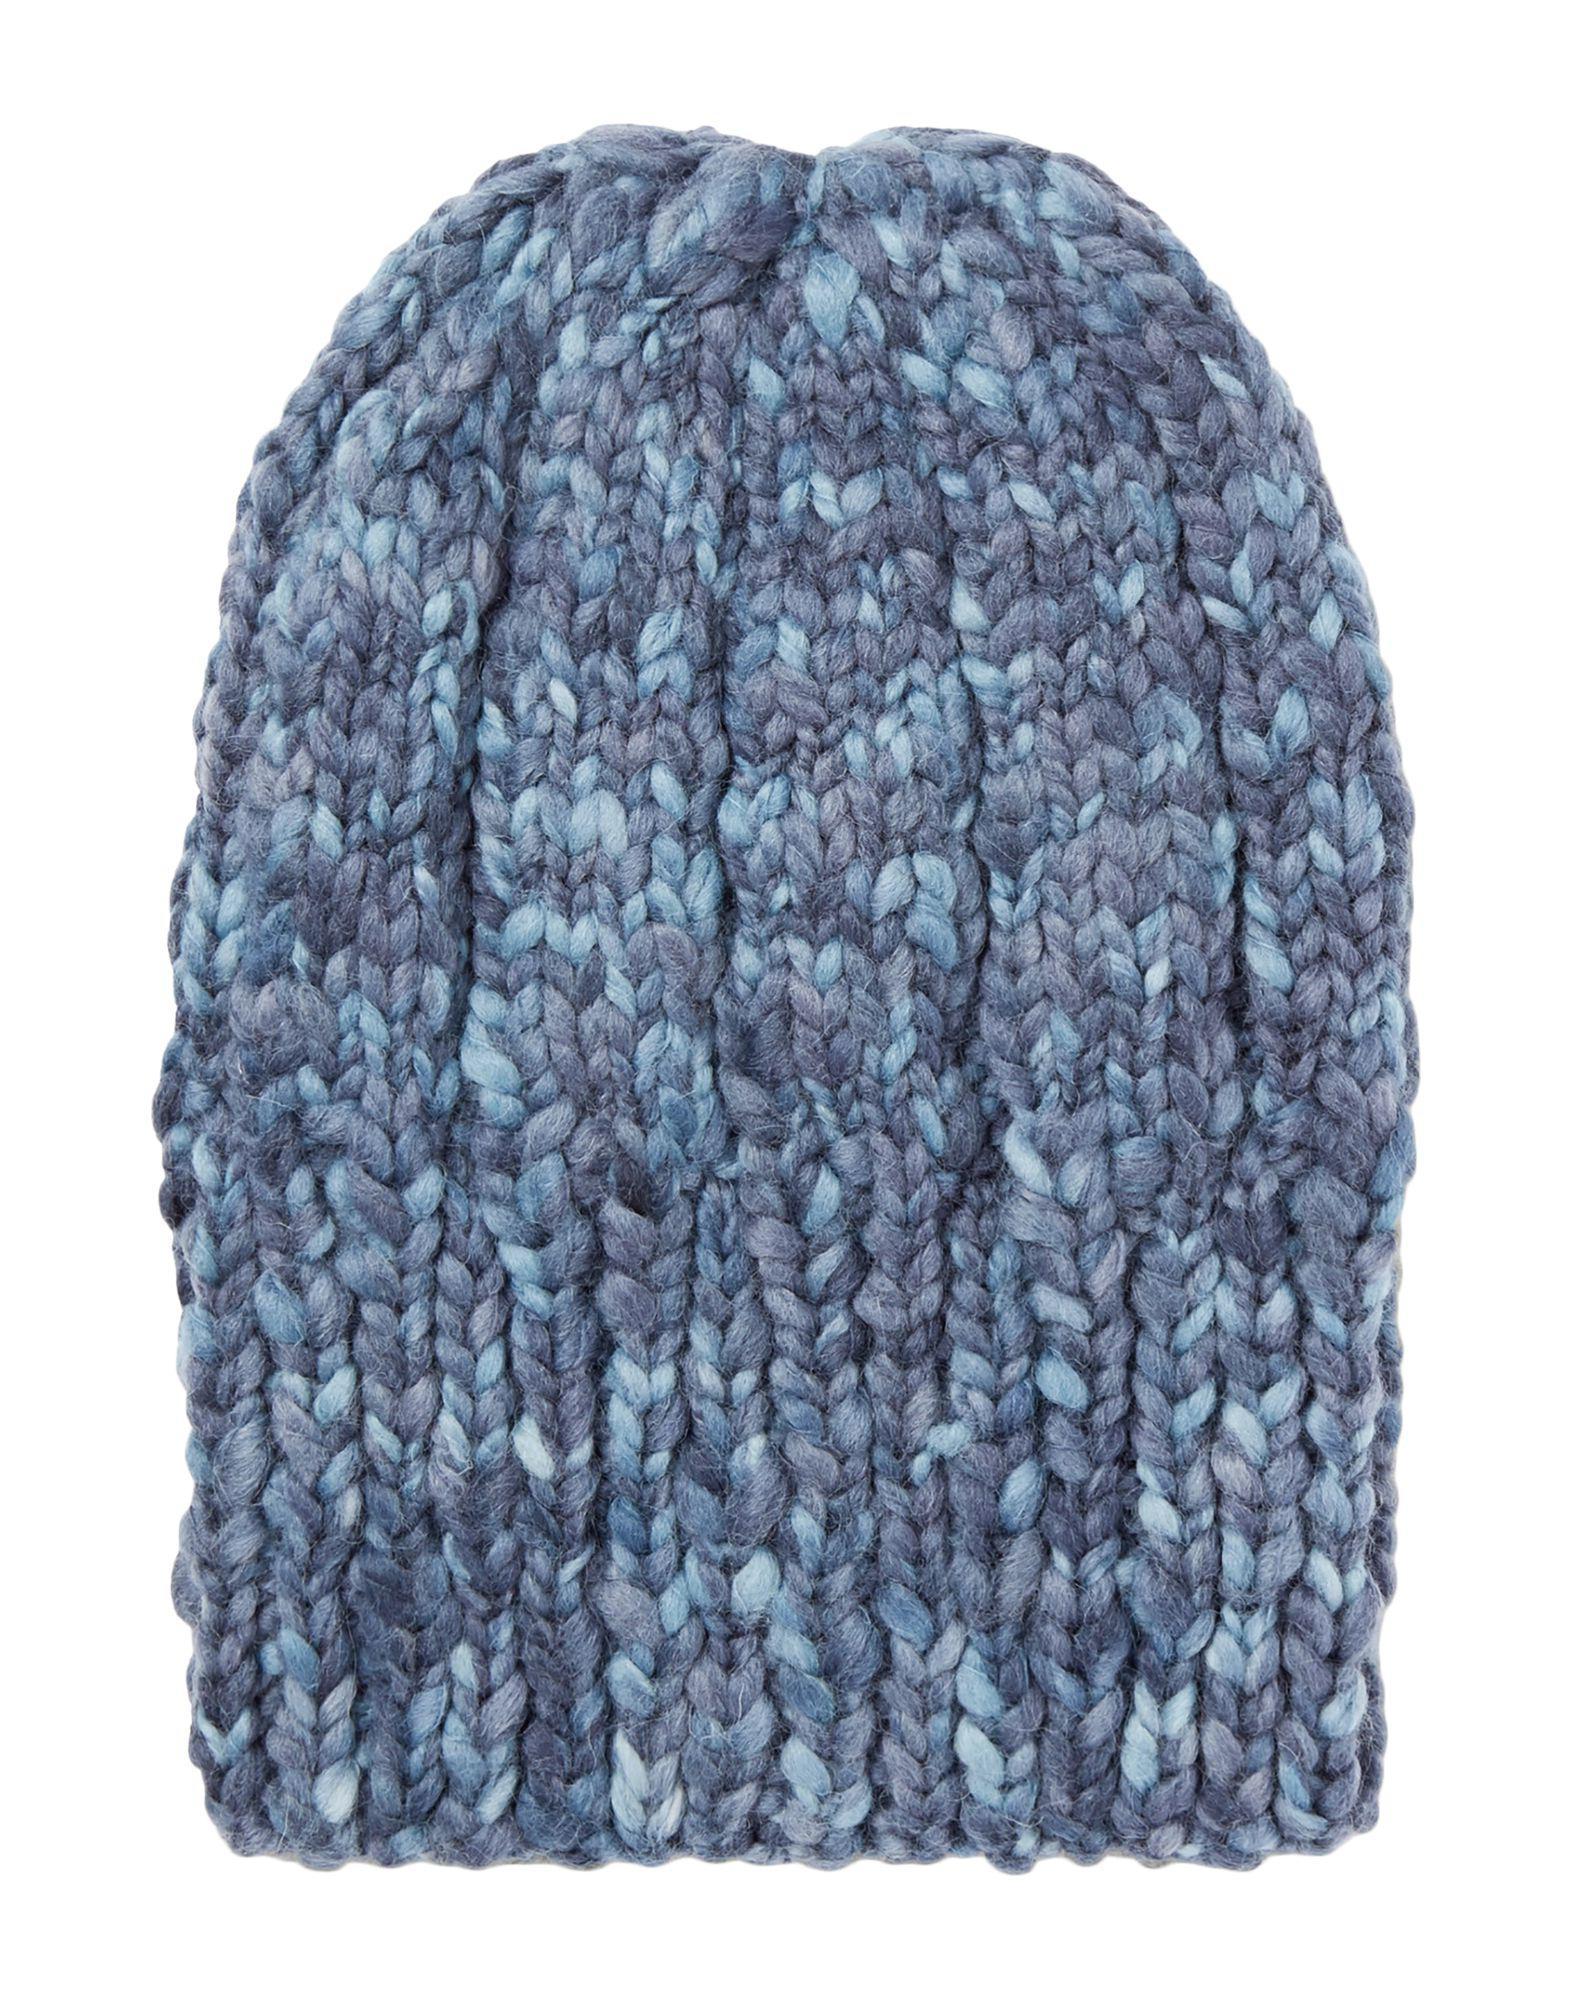 1d544d7dca7 Etro Hat in Blue for Men - Lyst